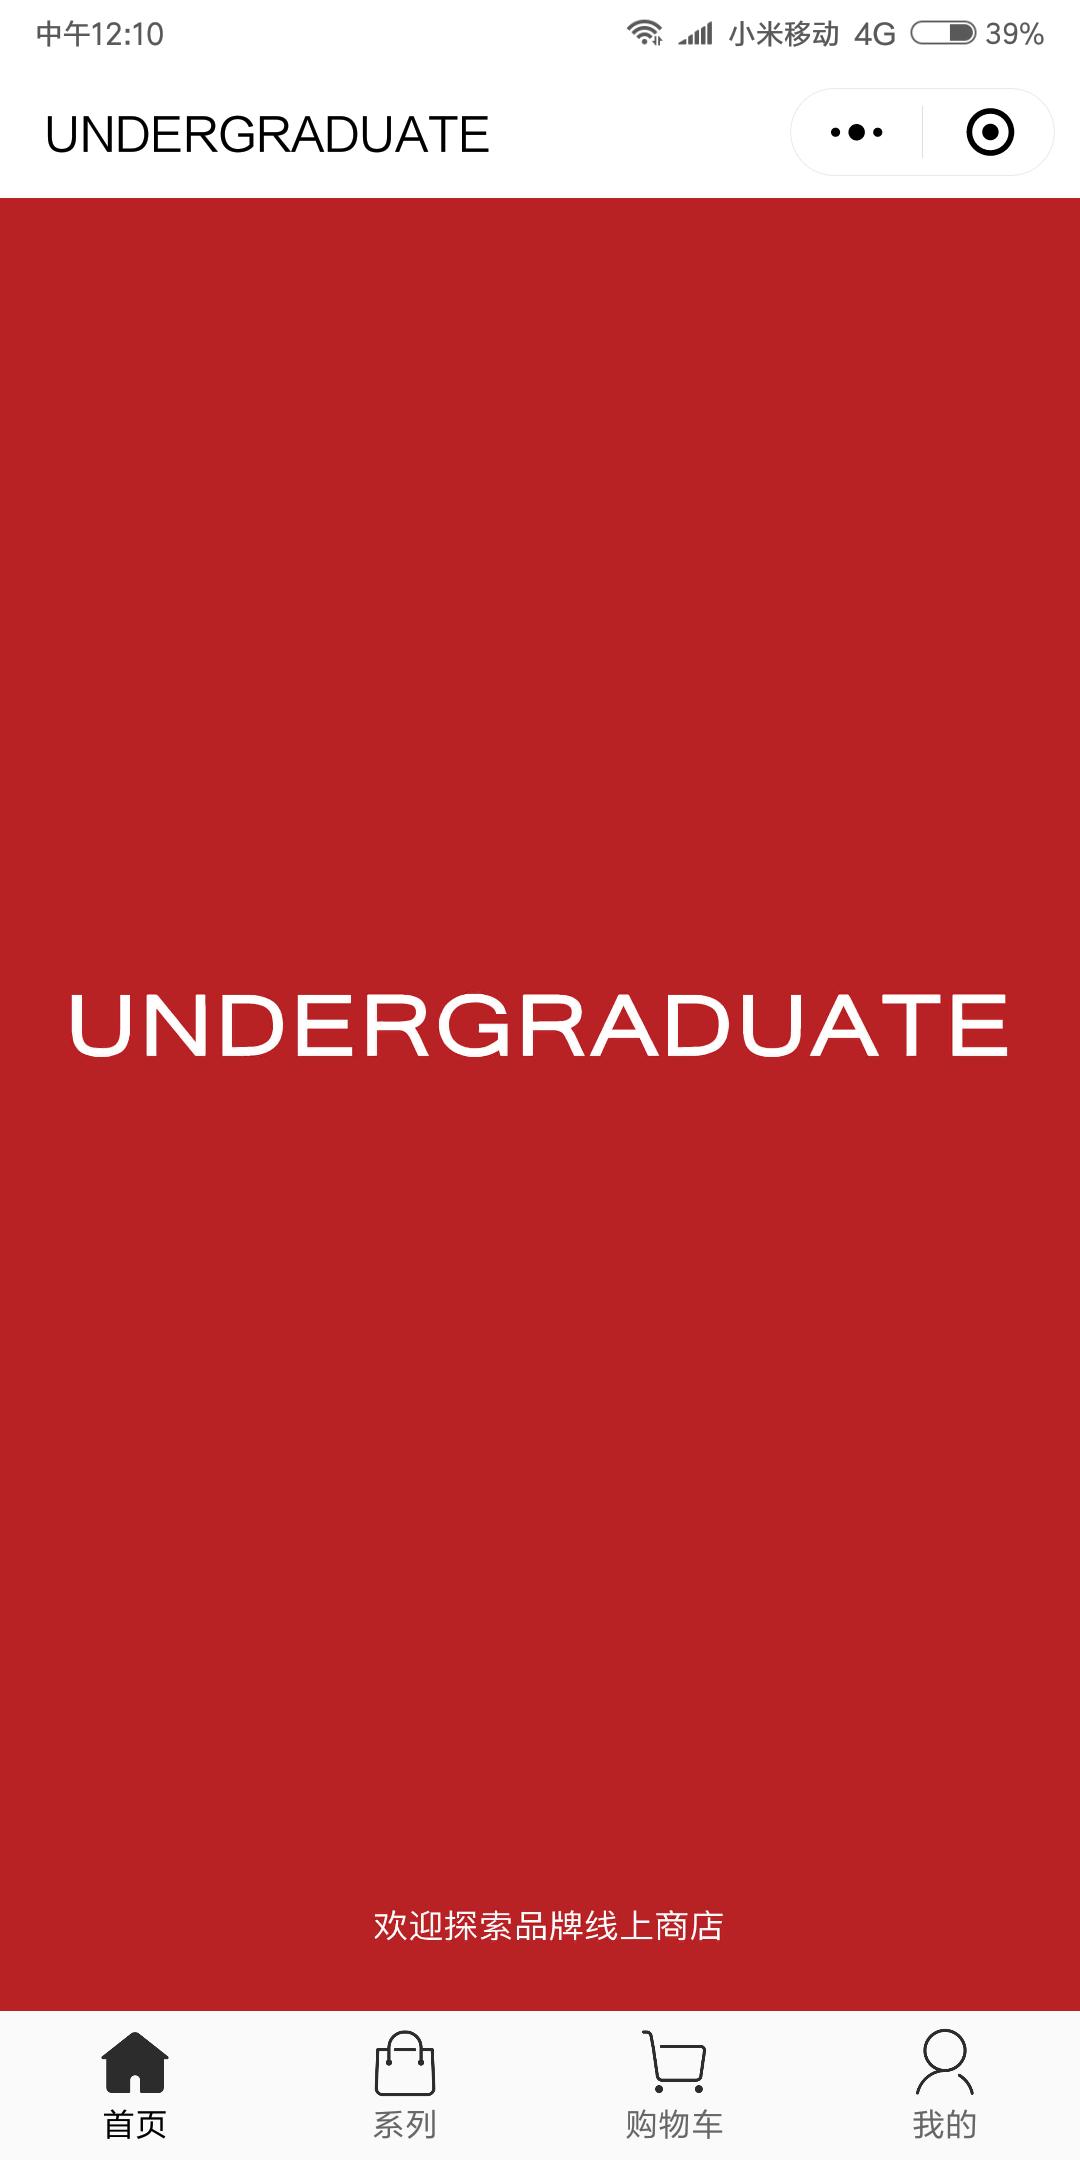 UNDERGRADUATE知名服装品牌小程序商城